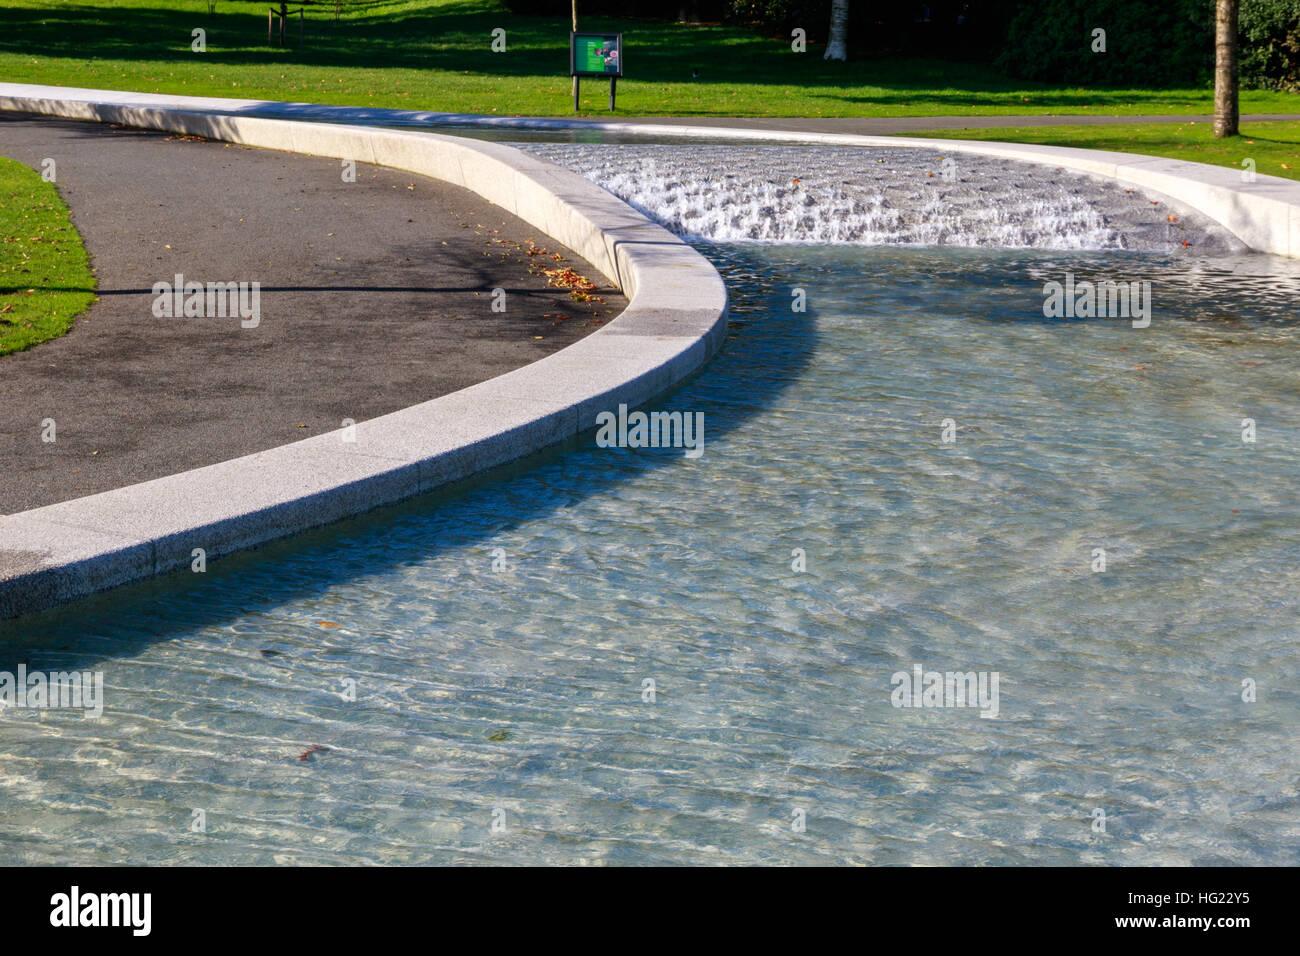 Princess Diana Memorial Fountain in Hyde Park, London - Stock Image